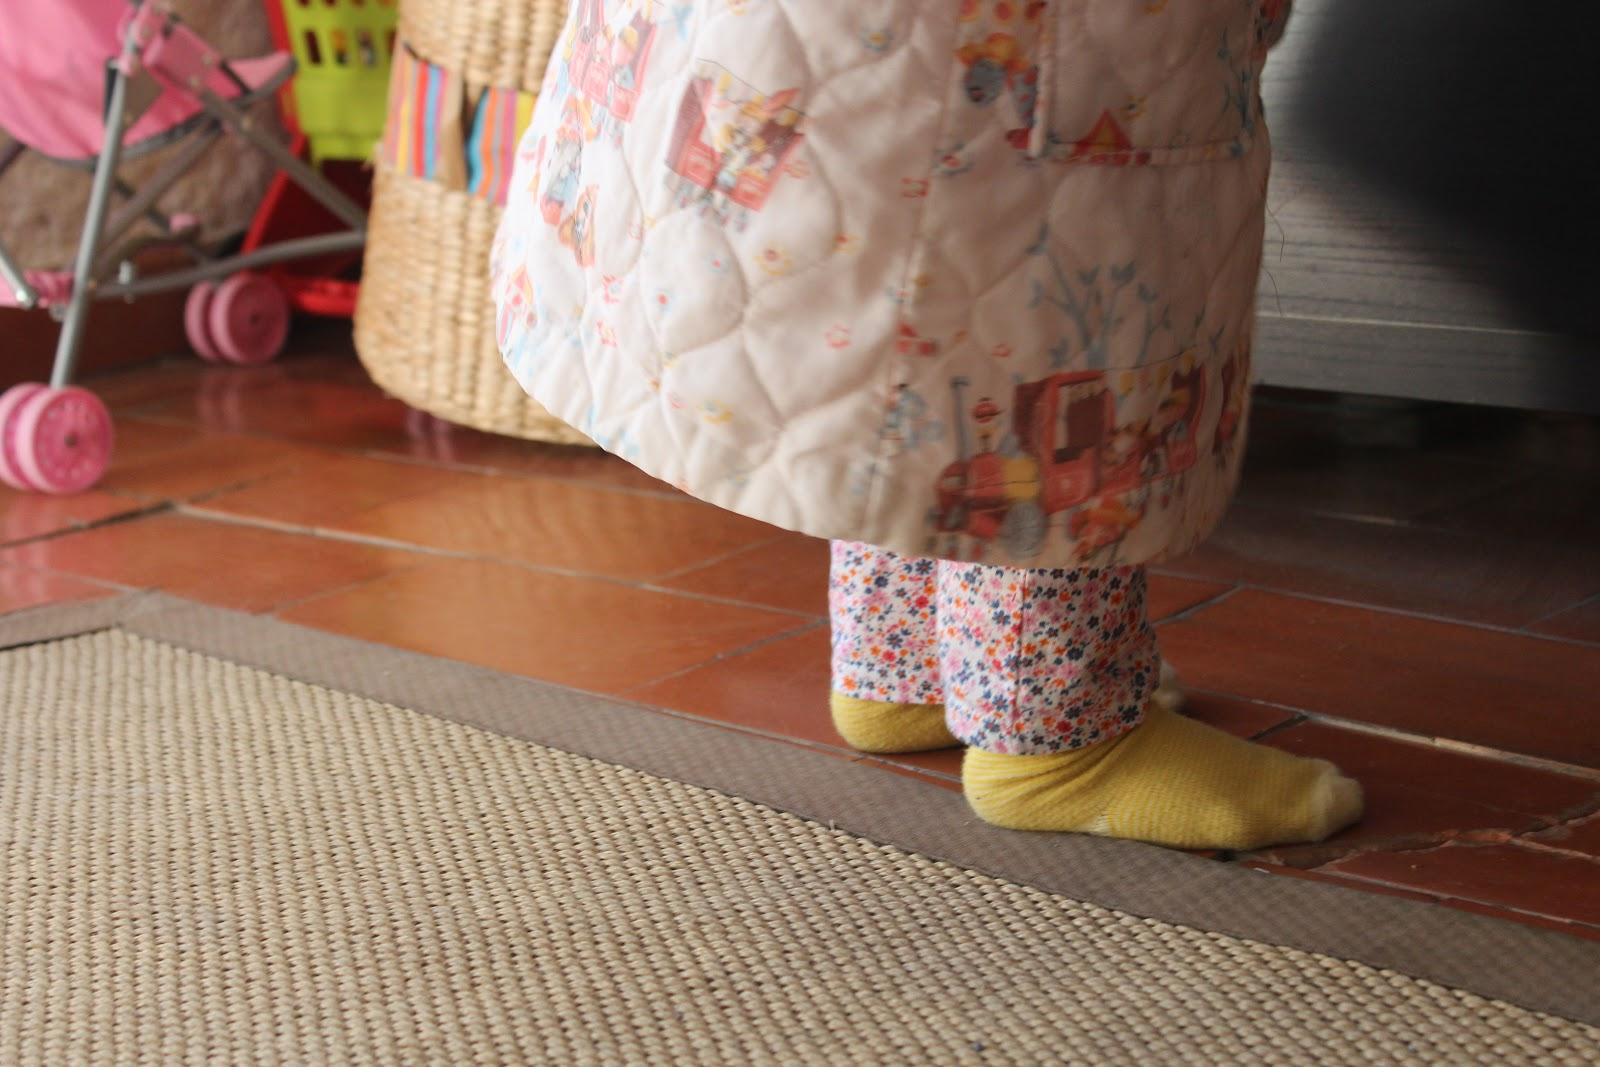 le grand retour de la robe de chambre ritalechat. Black Bedroom Furniture Sets. Home Design Ideas